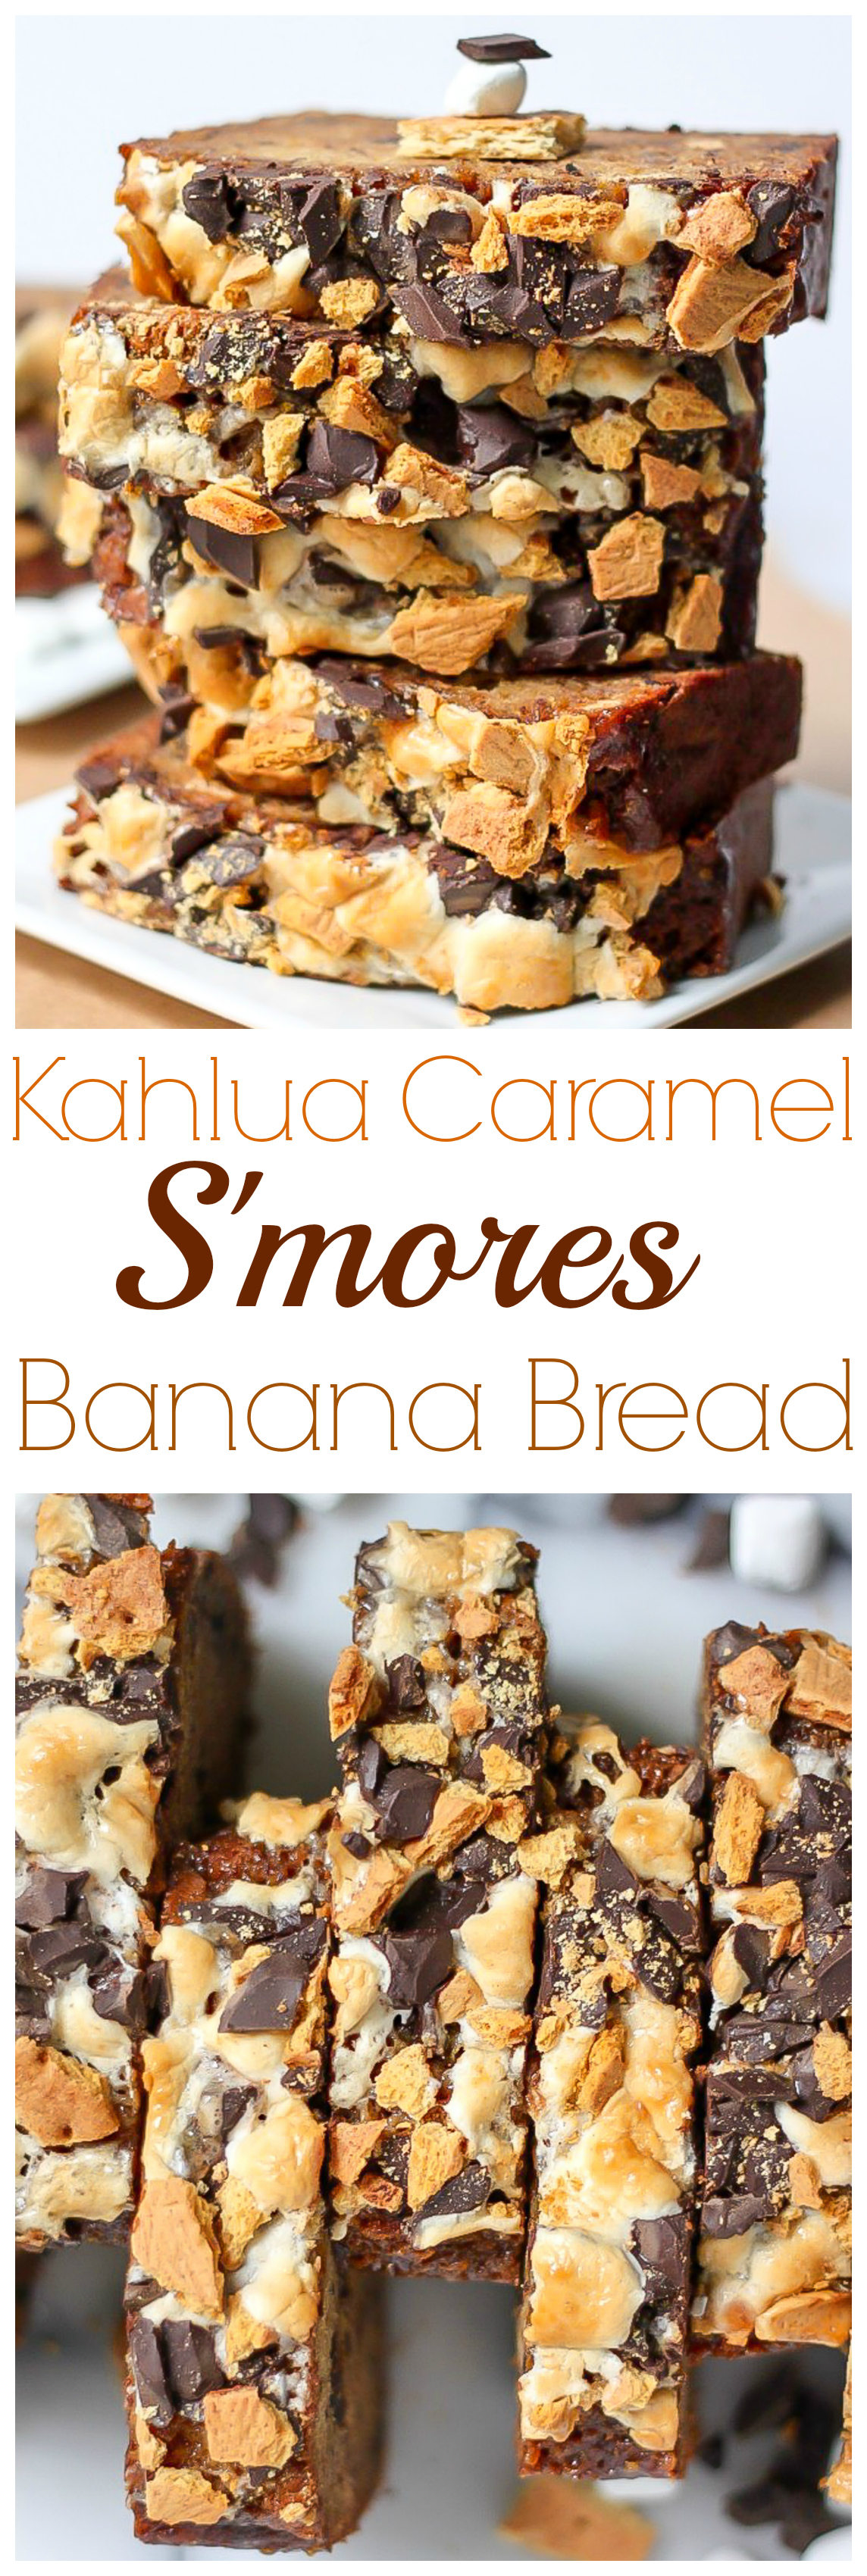 Kahlua Caramel S'mores Banana Bread - Baker by Nature